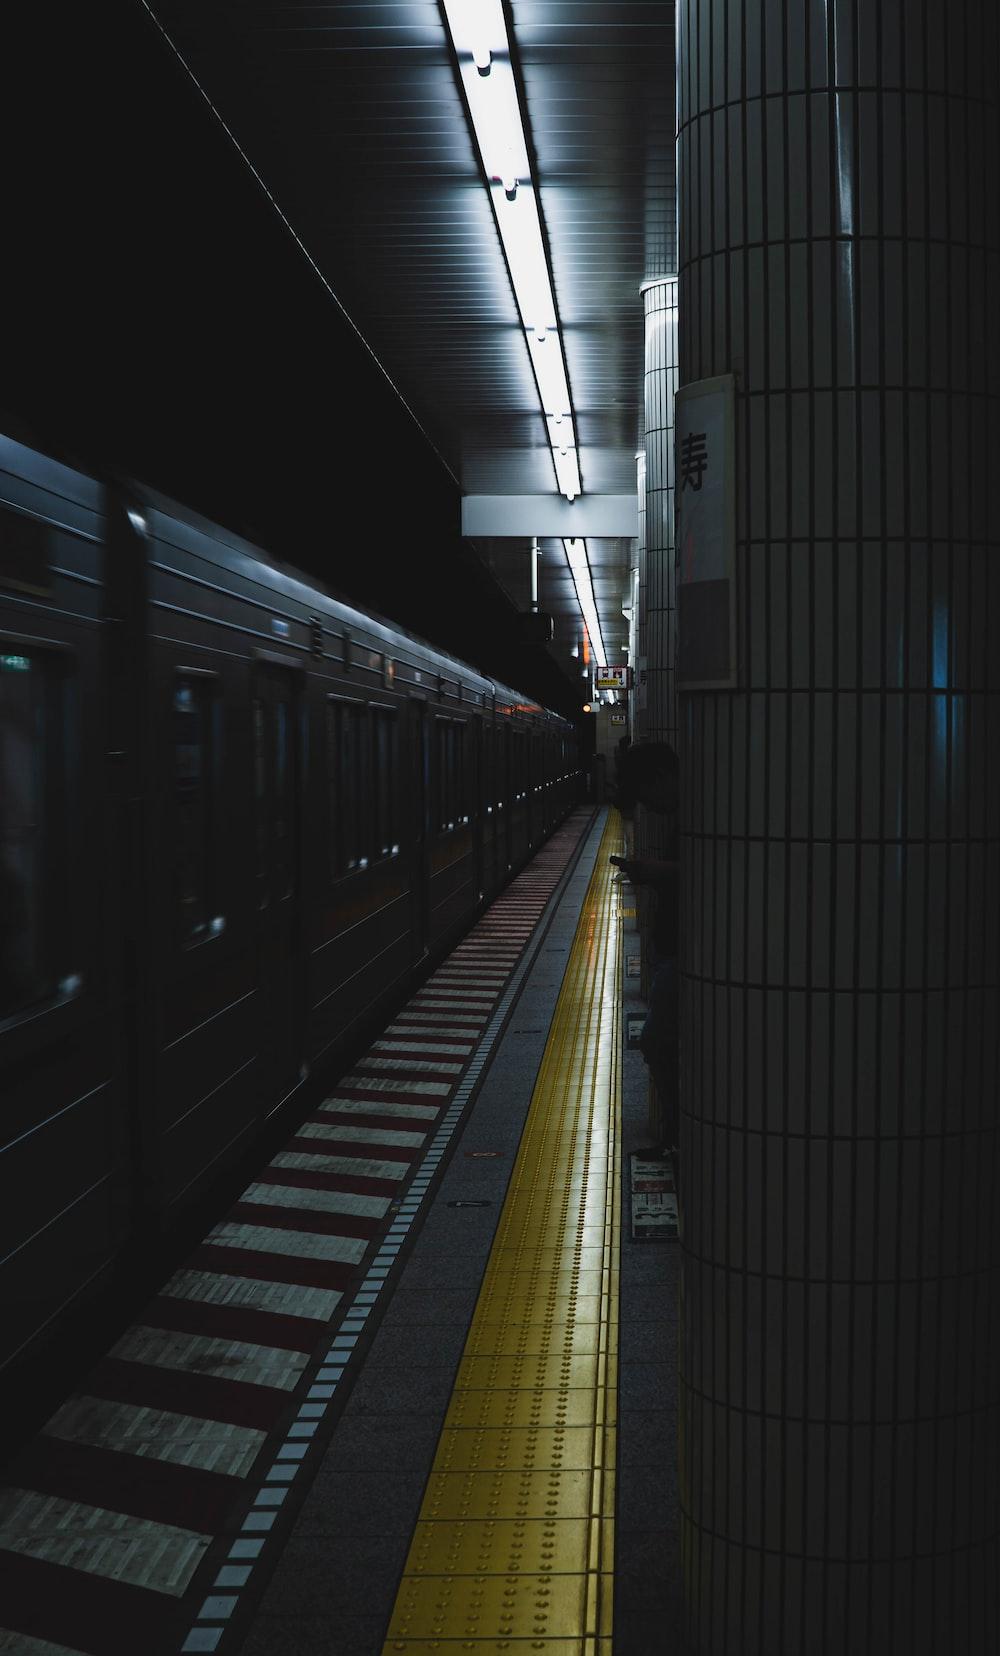 gray and yellow train platform and train